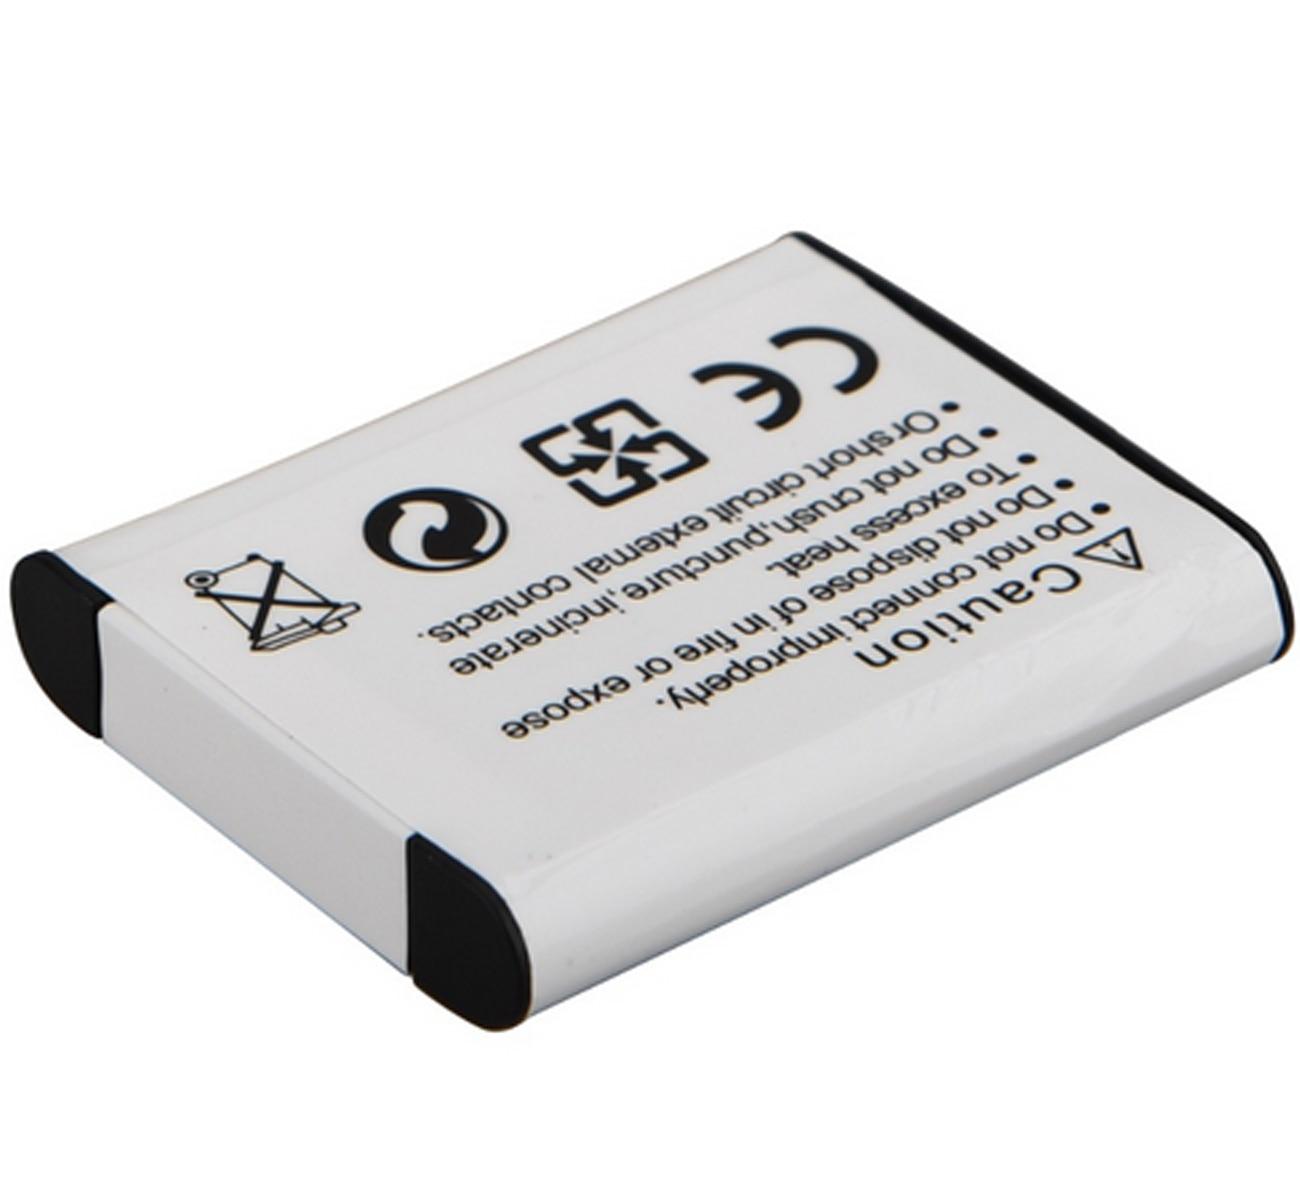 Cargador MICRO USB para SP-720 SP-720UZ